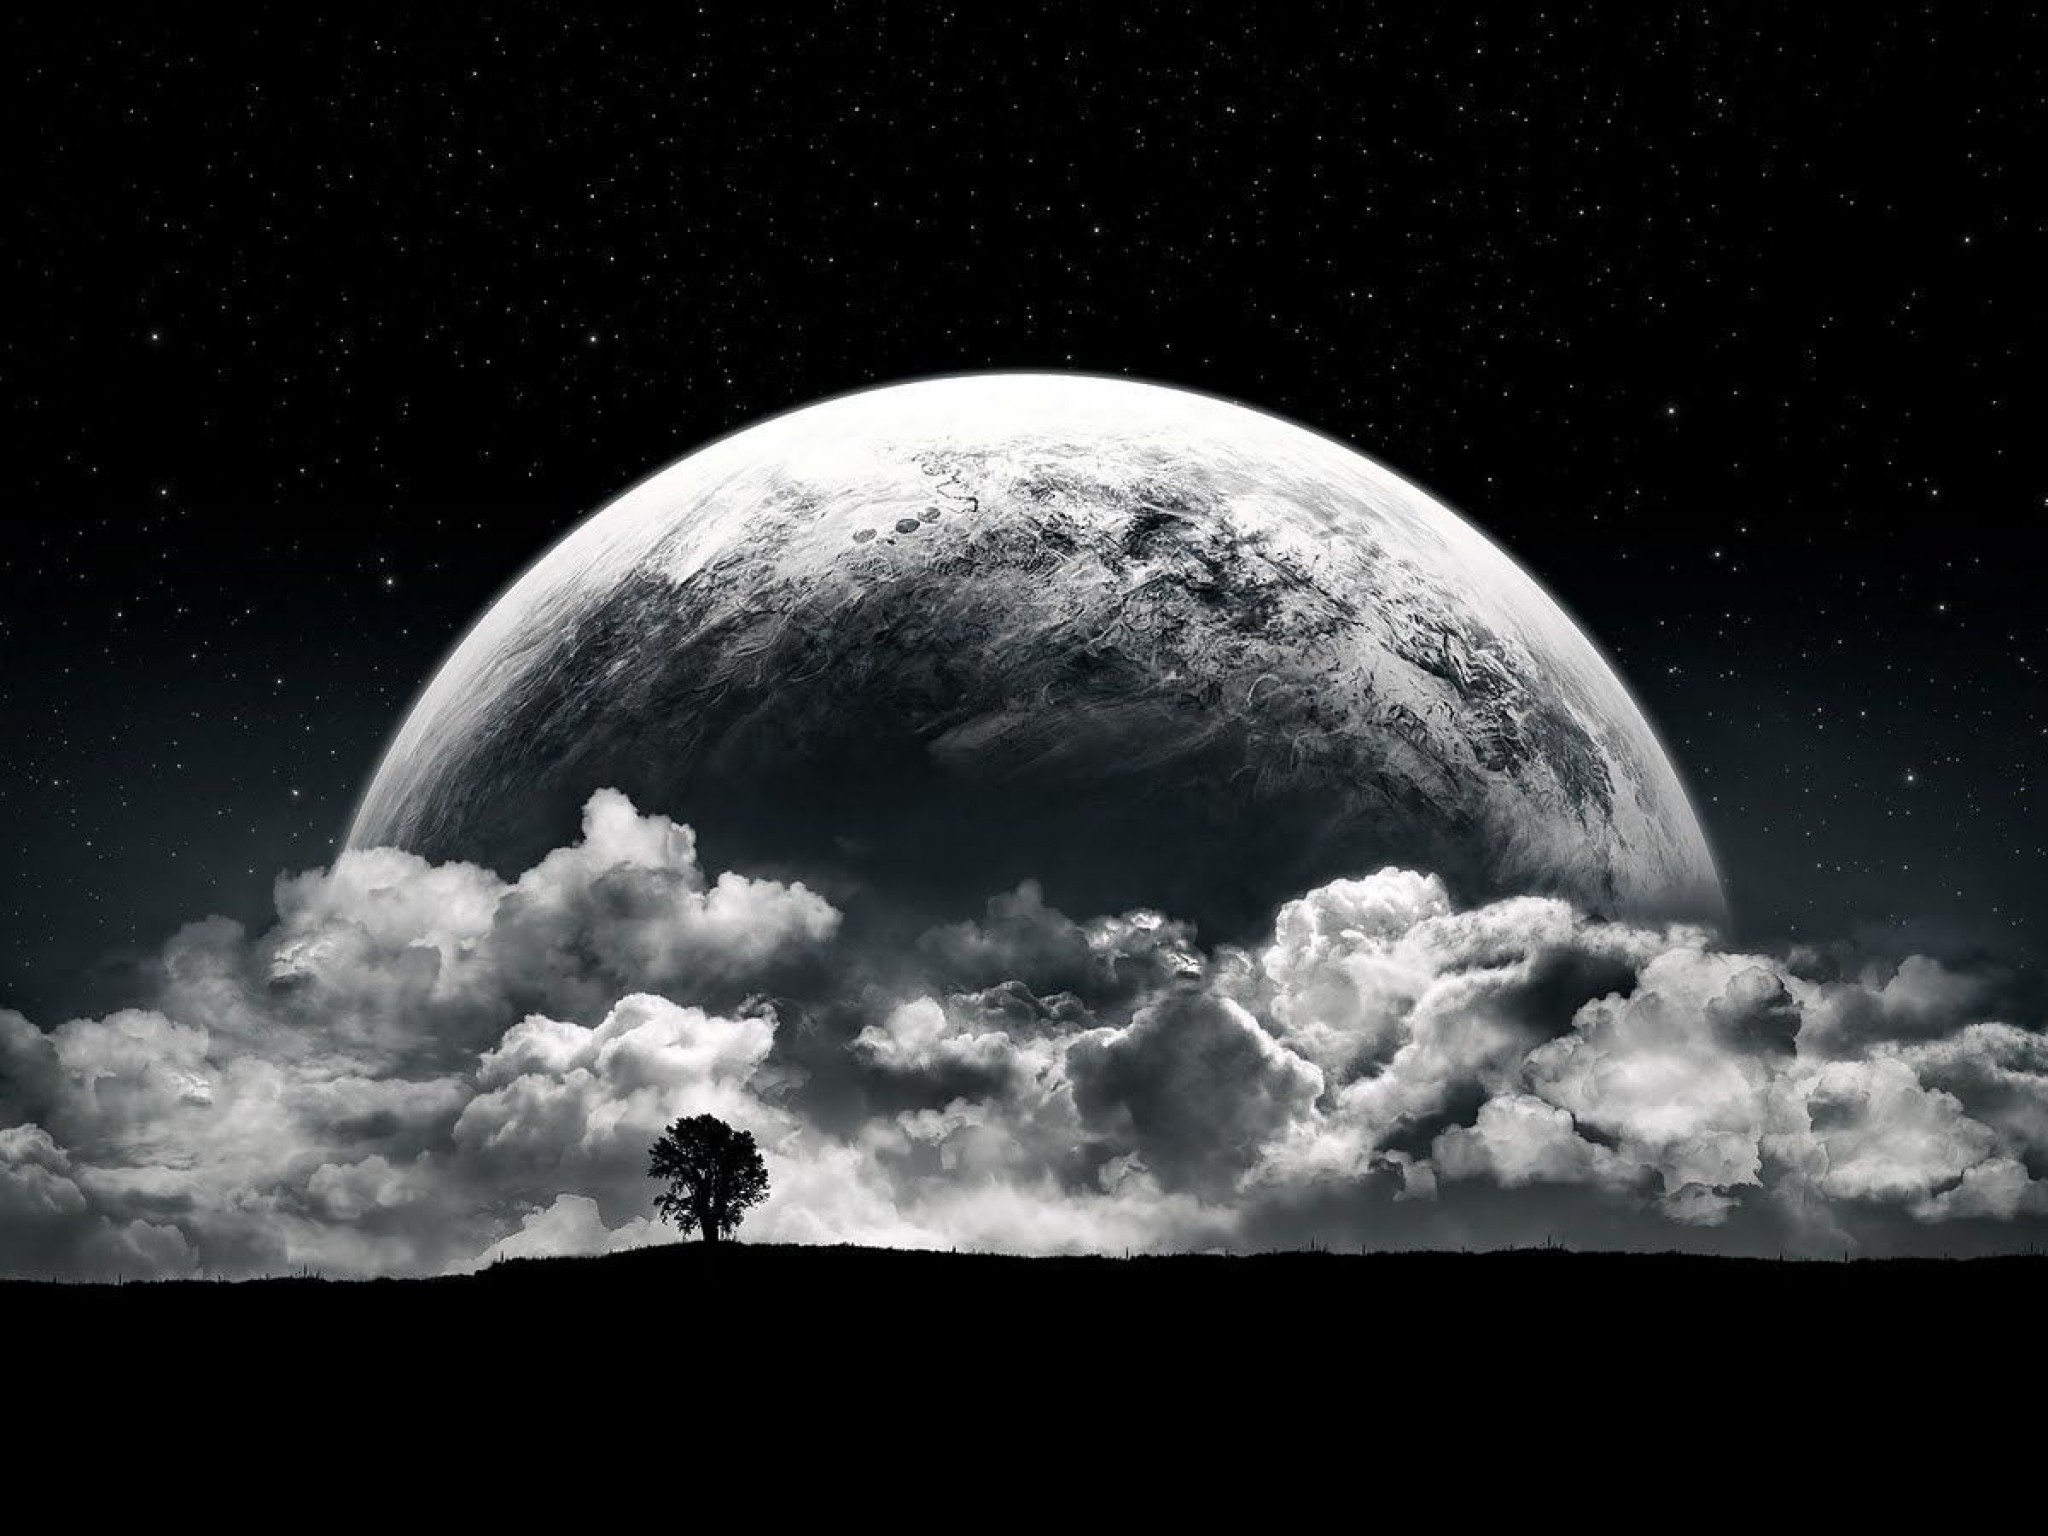 wallpaper dark planet - photo #25